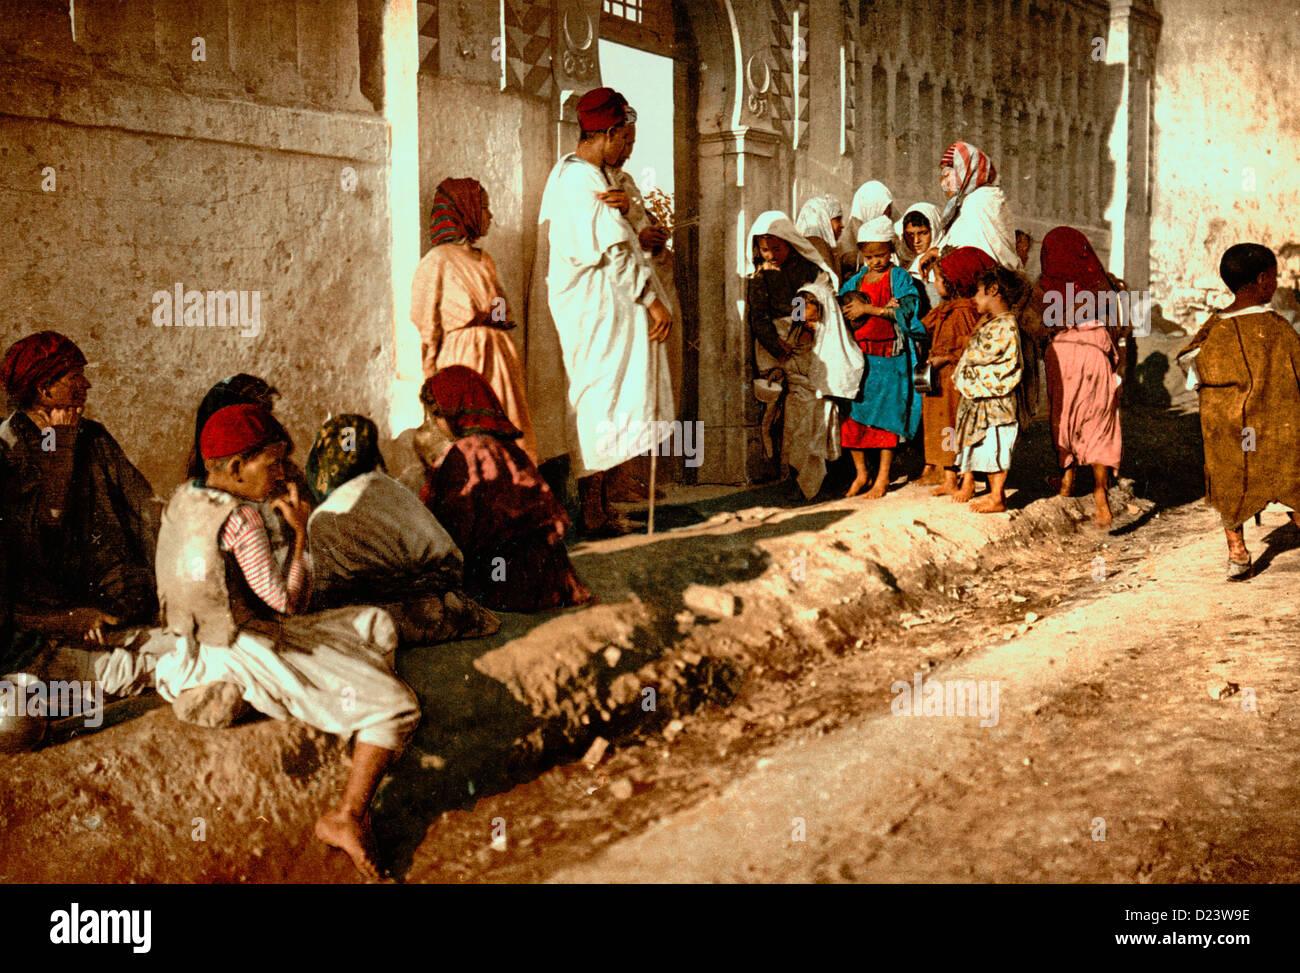 Beggars in front of mosque 'Sidi Abderrhaman', Algiers, Algeria, circa 1899 - Stock Image